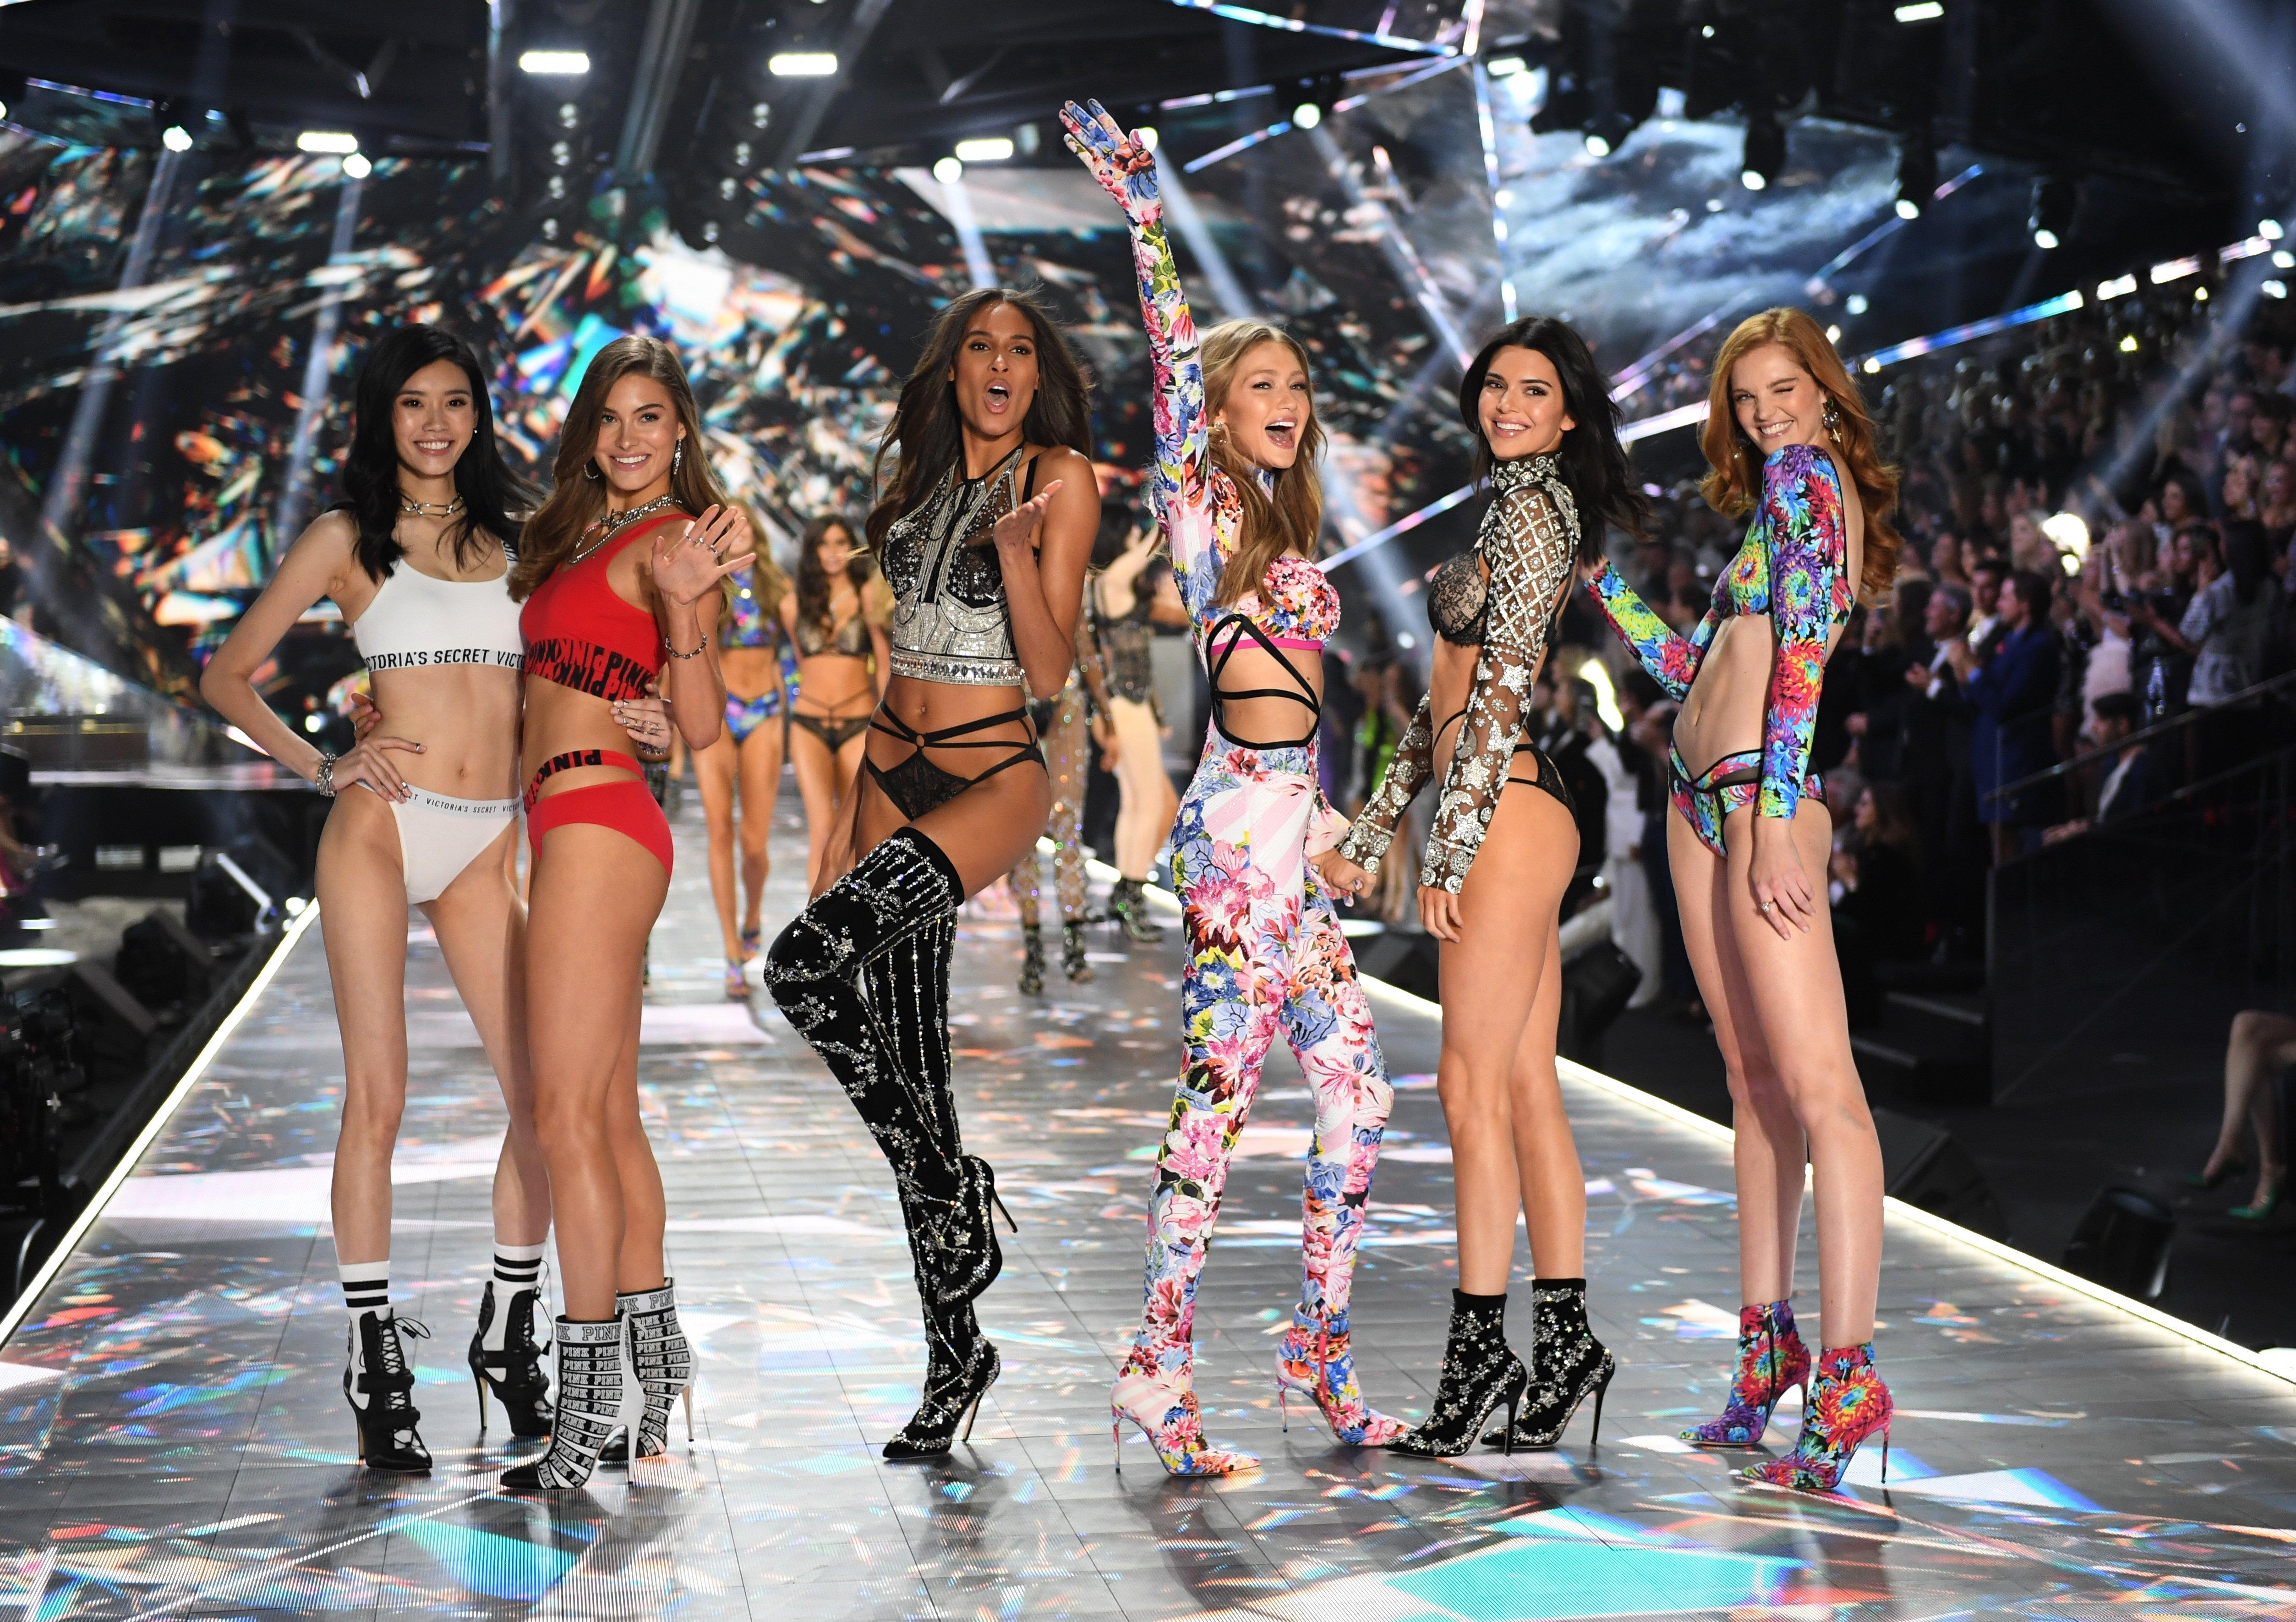 What's Next For Victoria's Secret?